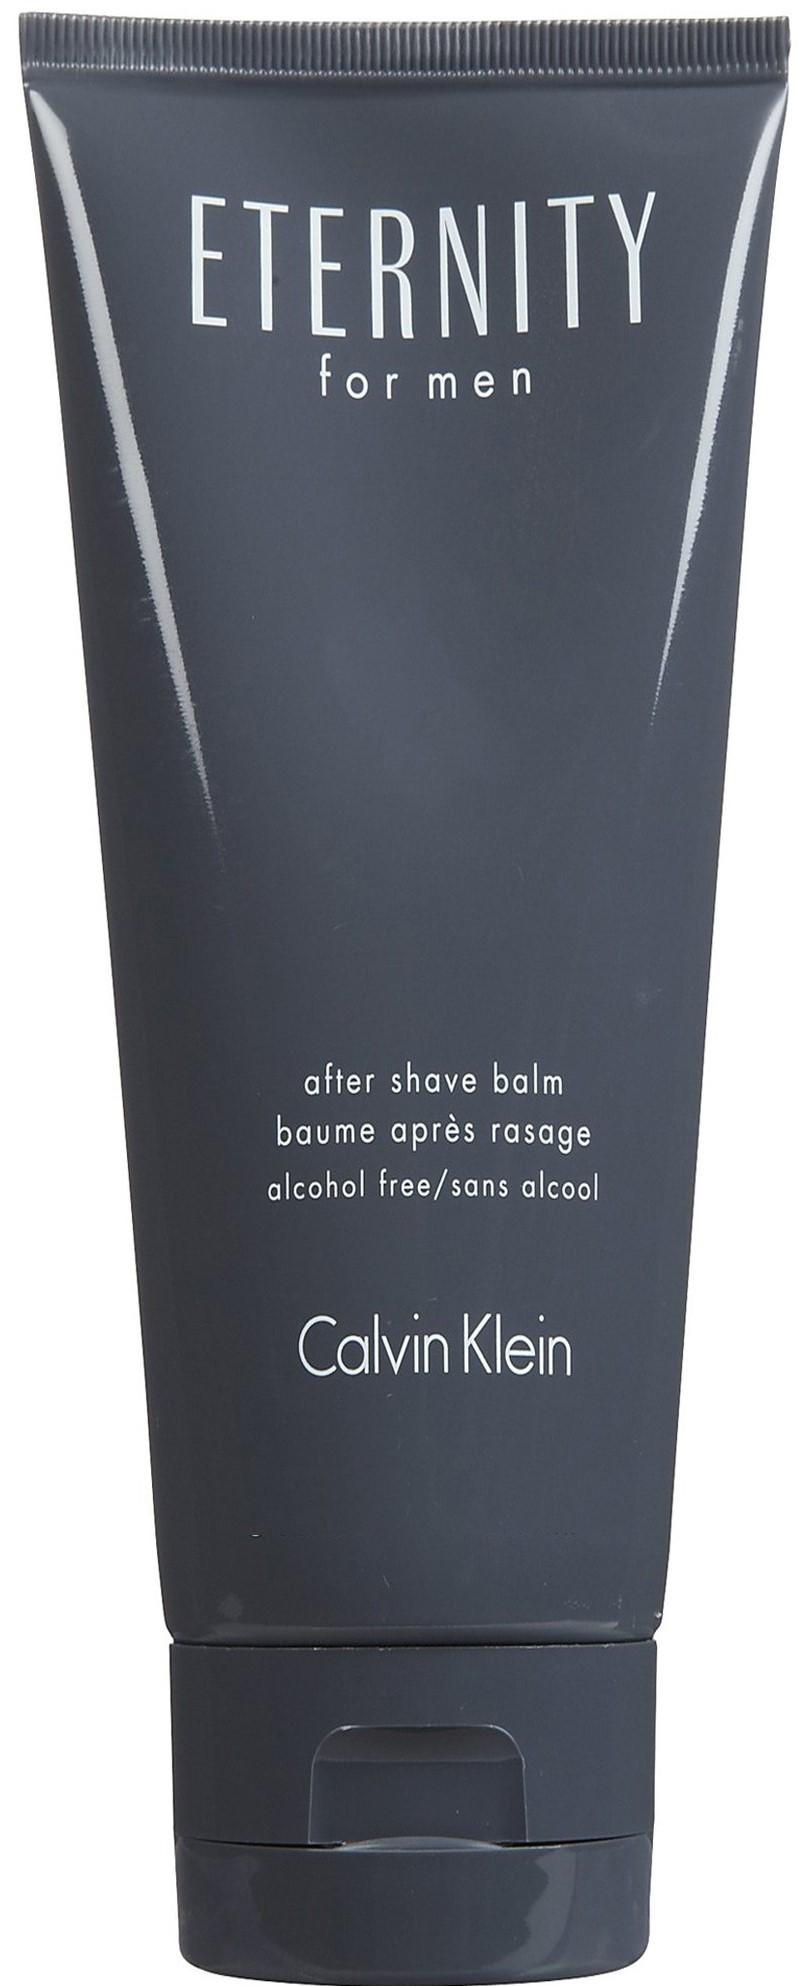 Calvin Klein Eternity After Shave Balm 100ml